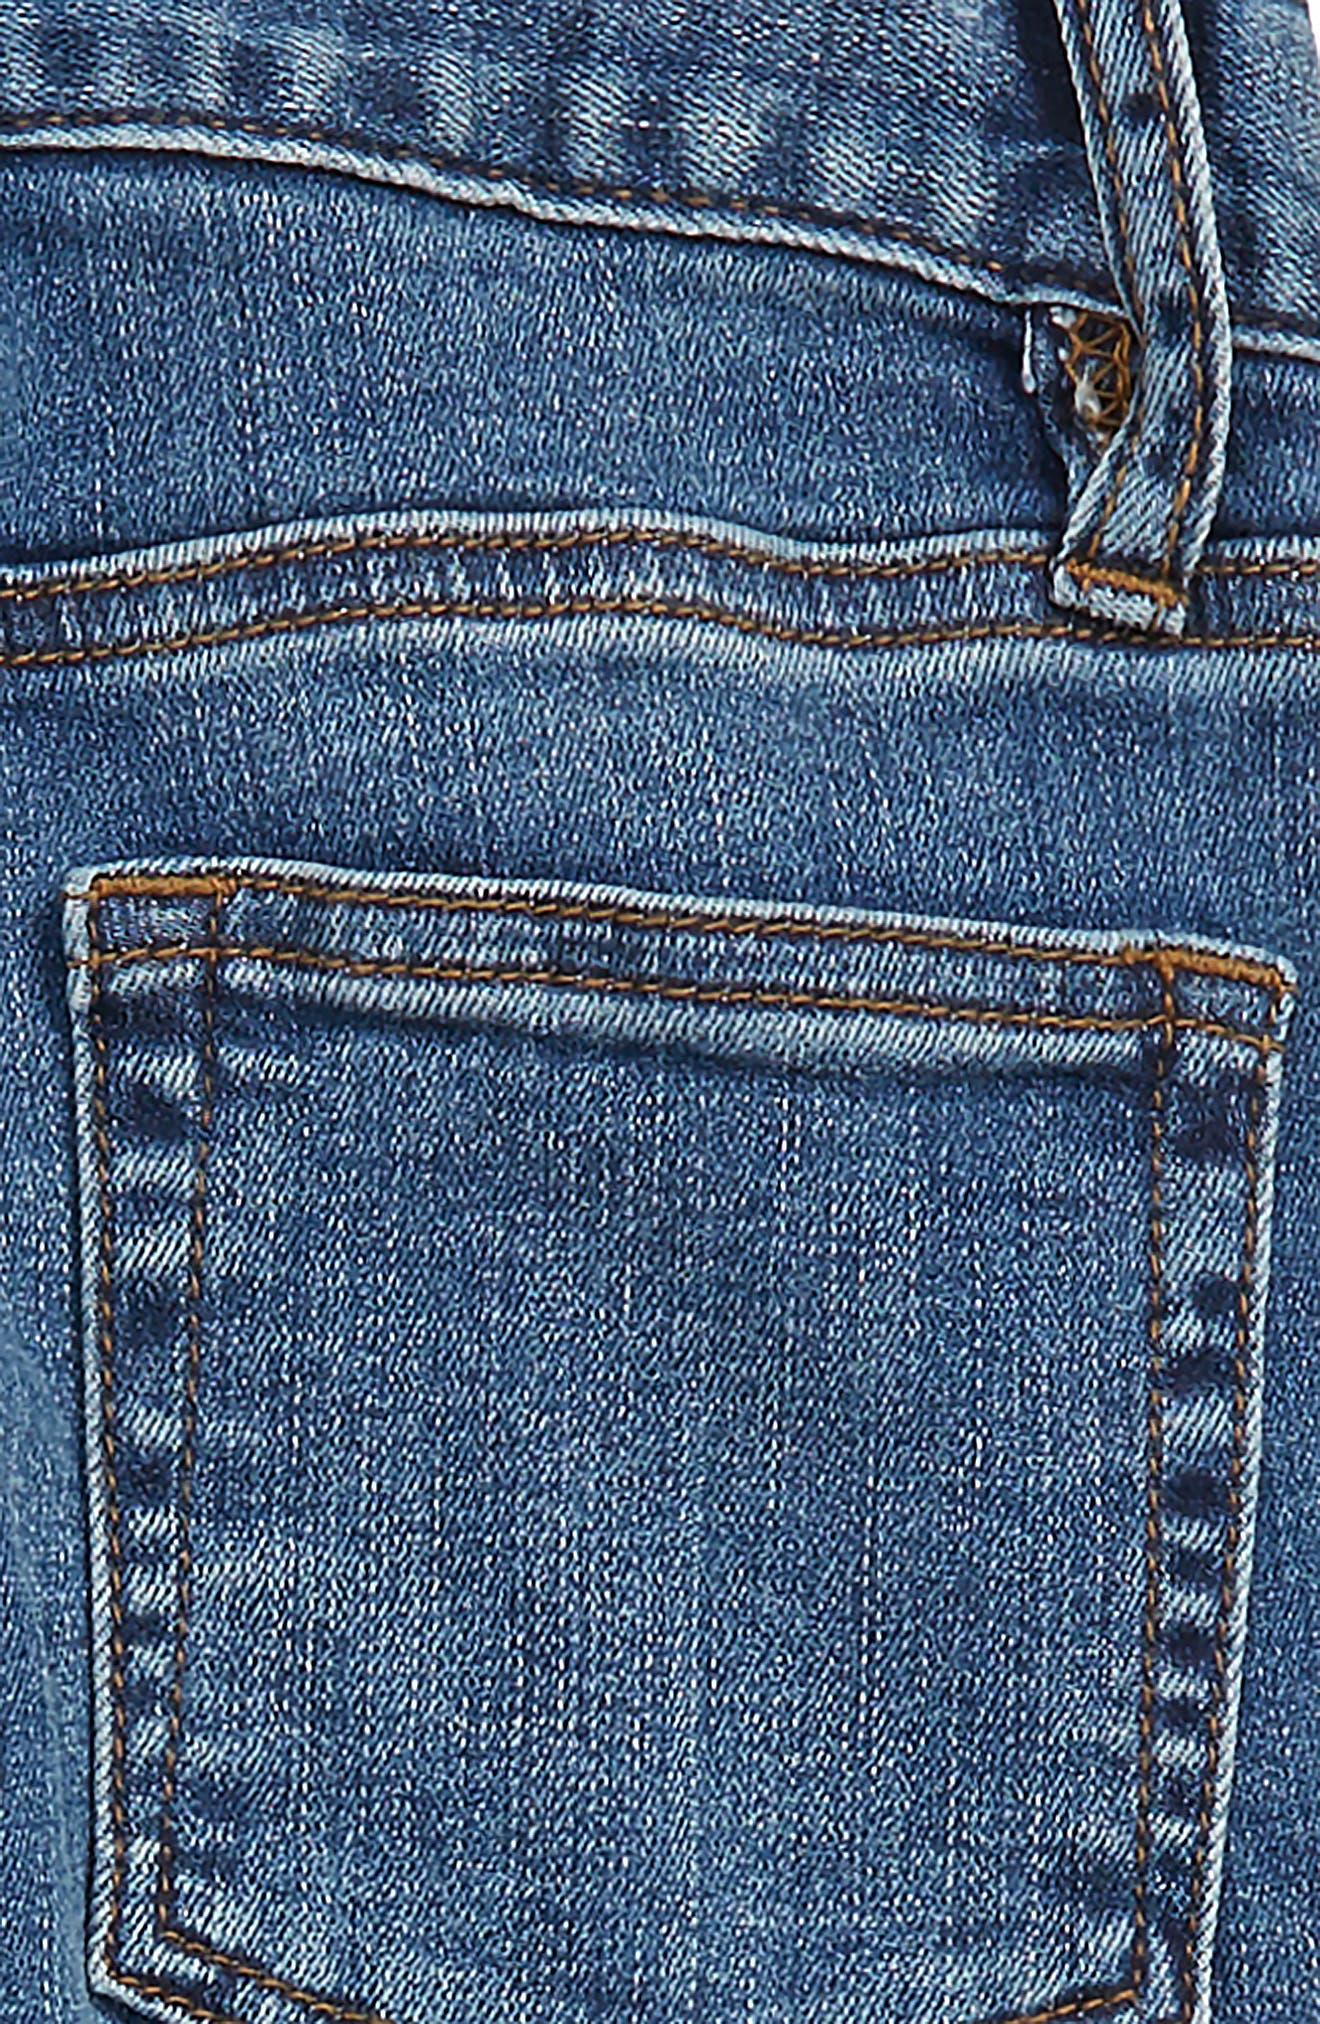 Runaround Slim Fit Jeans,                             Alternate thumbnail 3, color,                             400